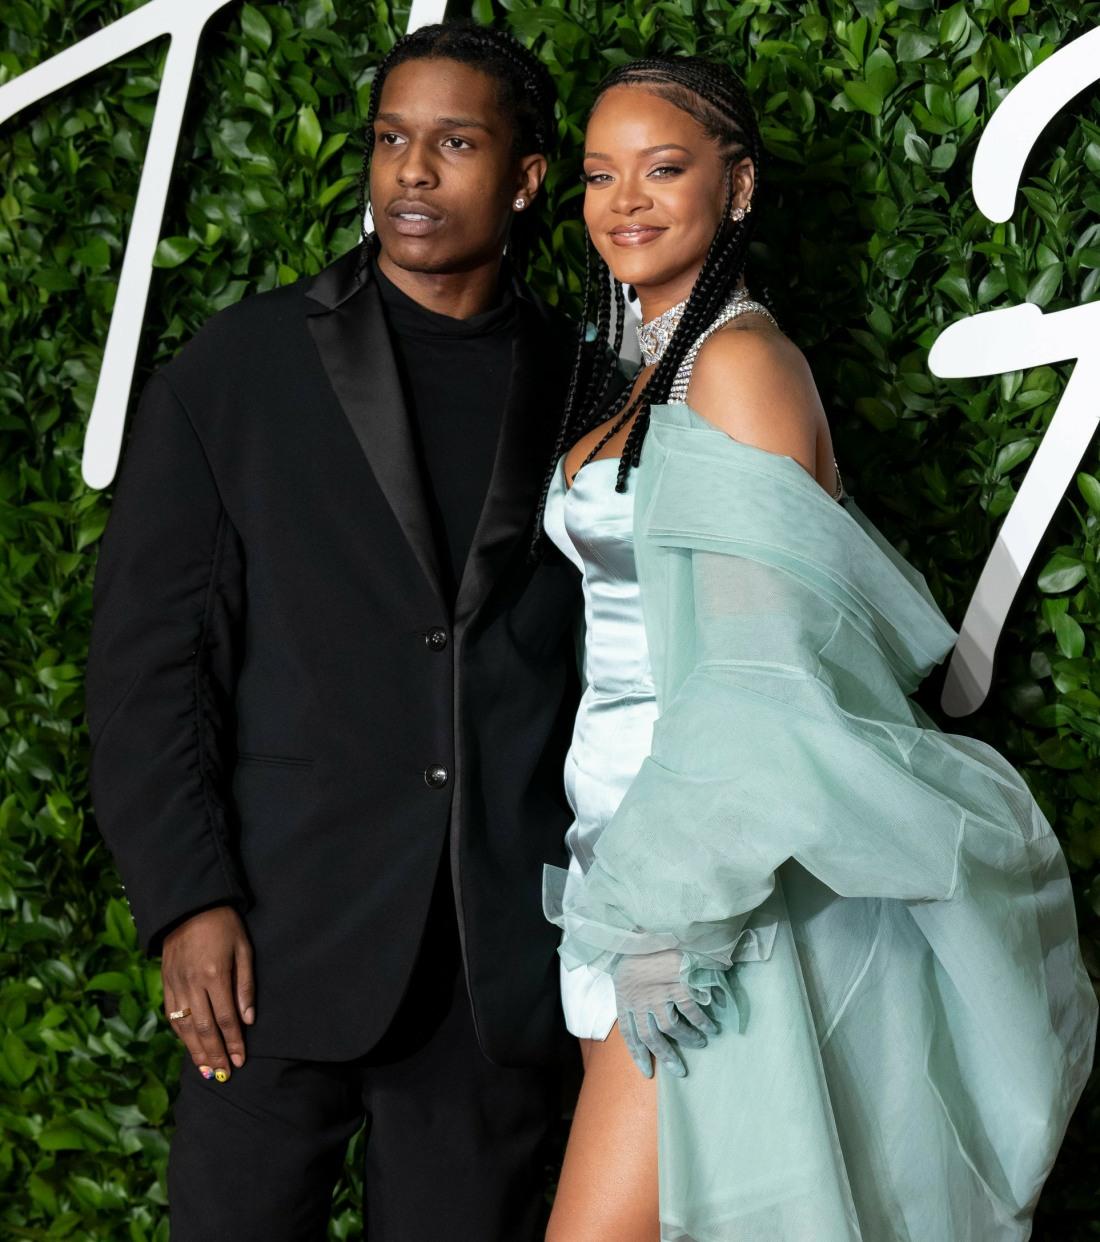 Rihanna and ASAP Rocky attend The Fashion Awards 2019 at The Royal Albert Hall. London, UK. 02/12/2019